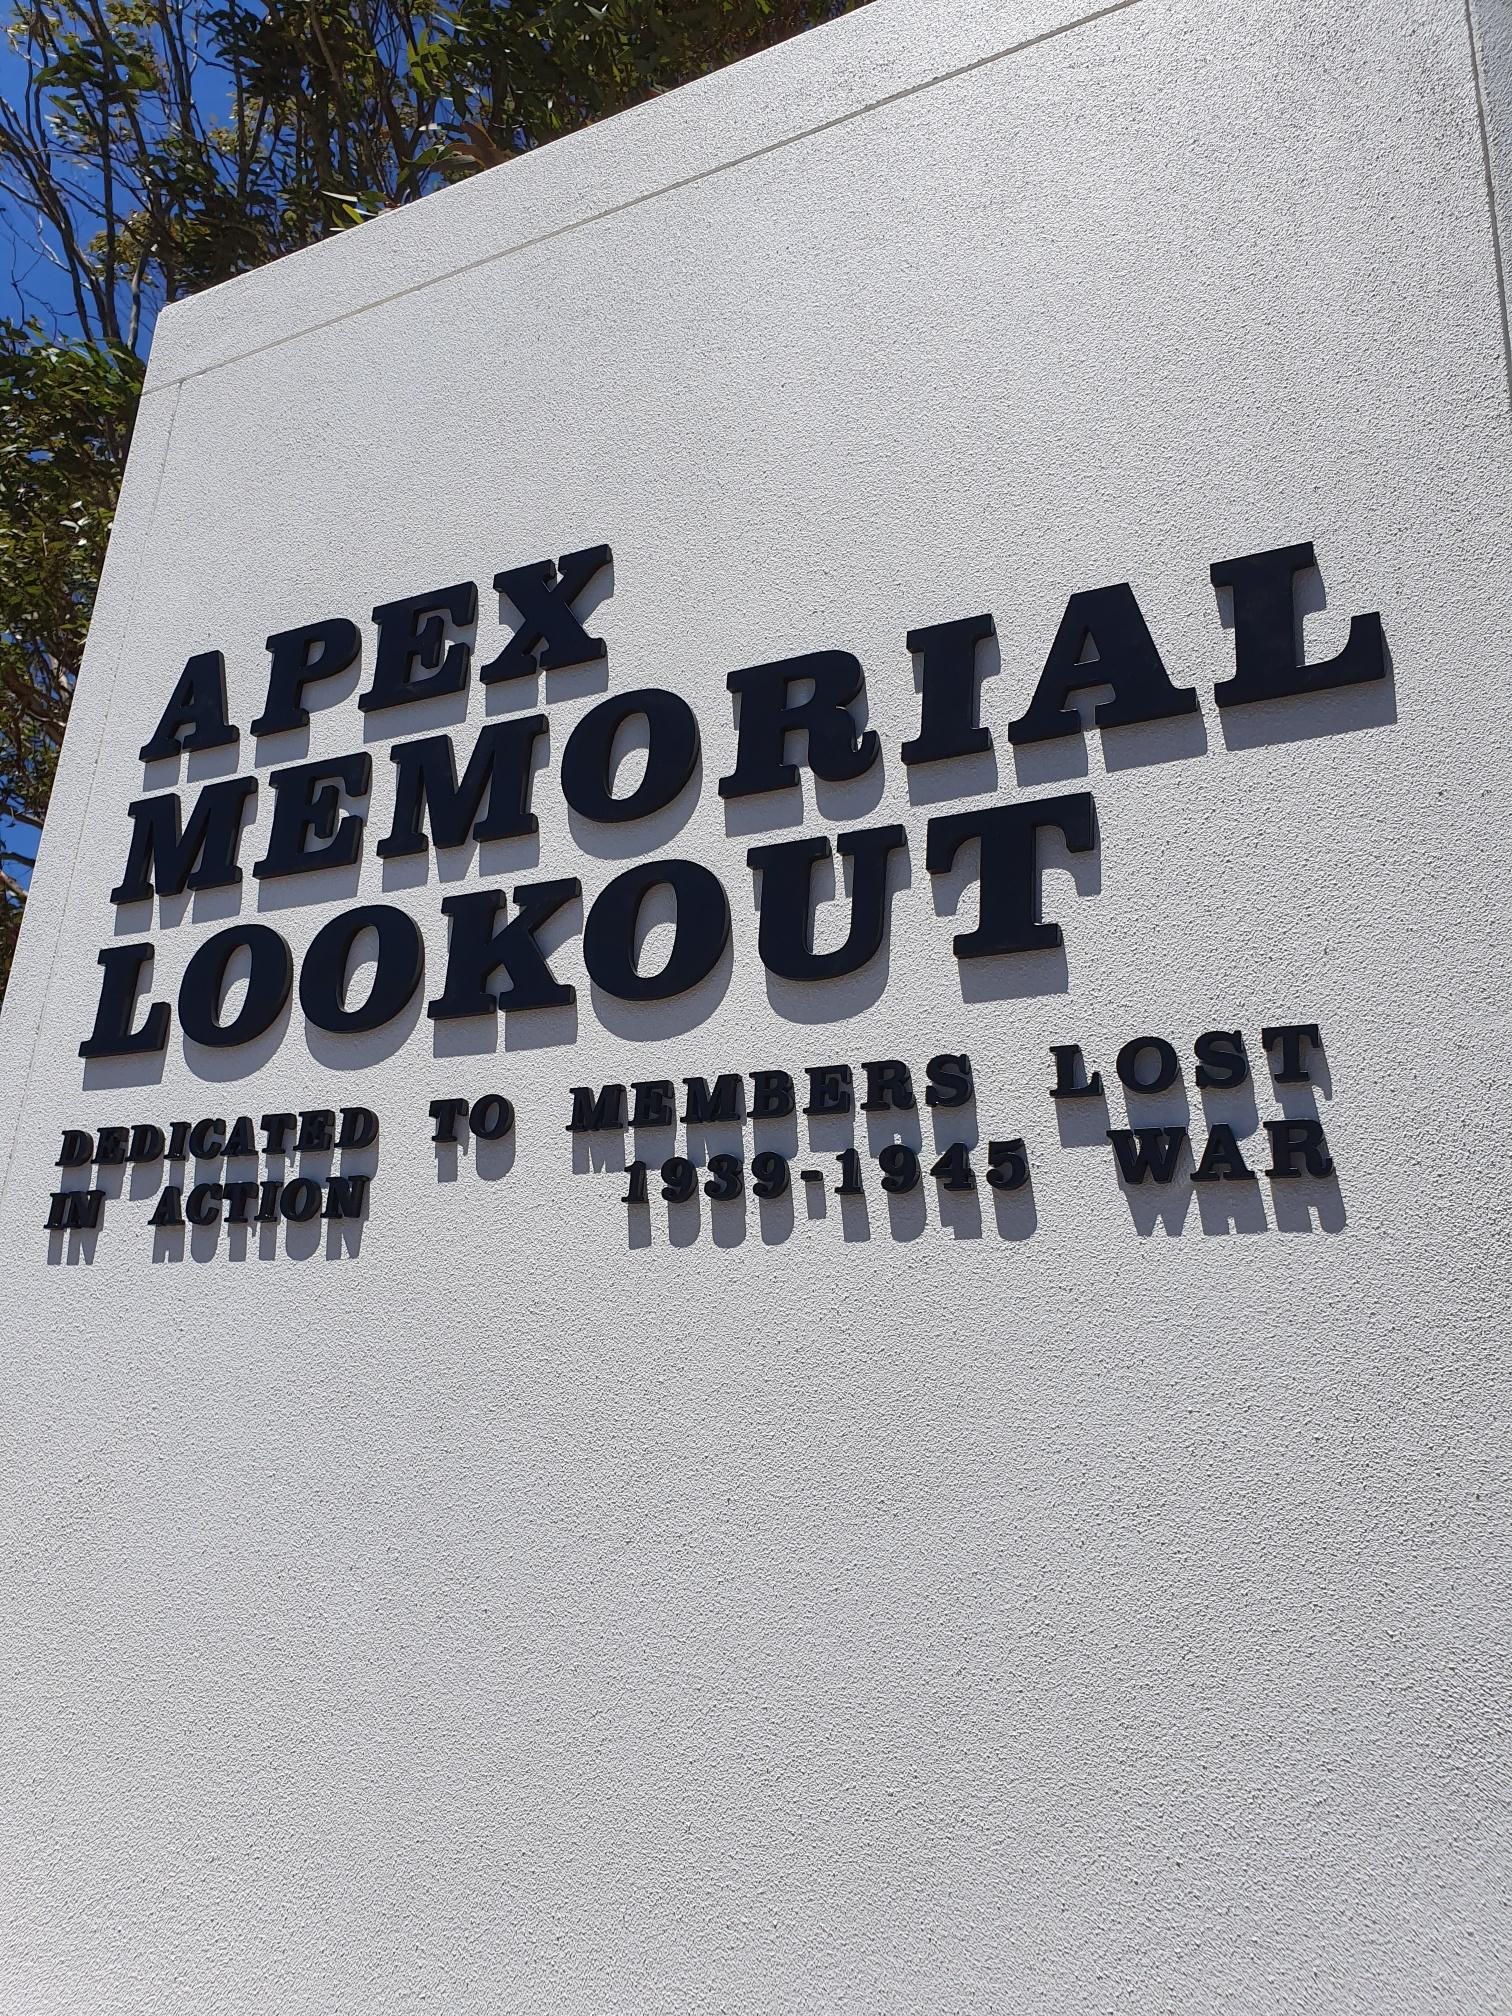 AOK Signs - Memorial Lookout